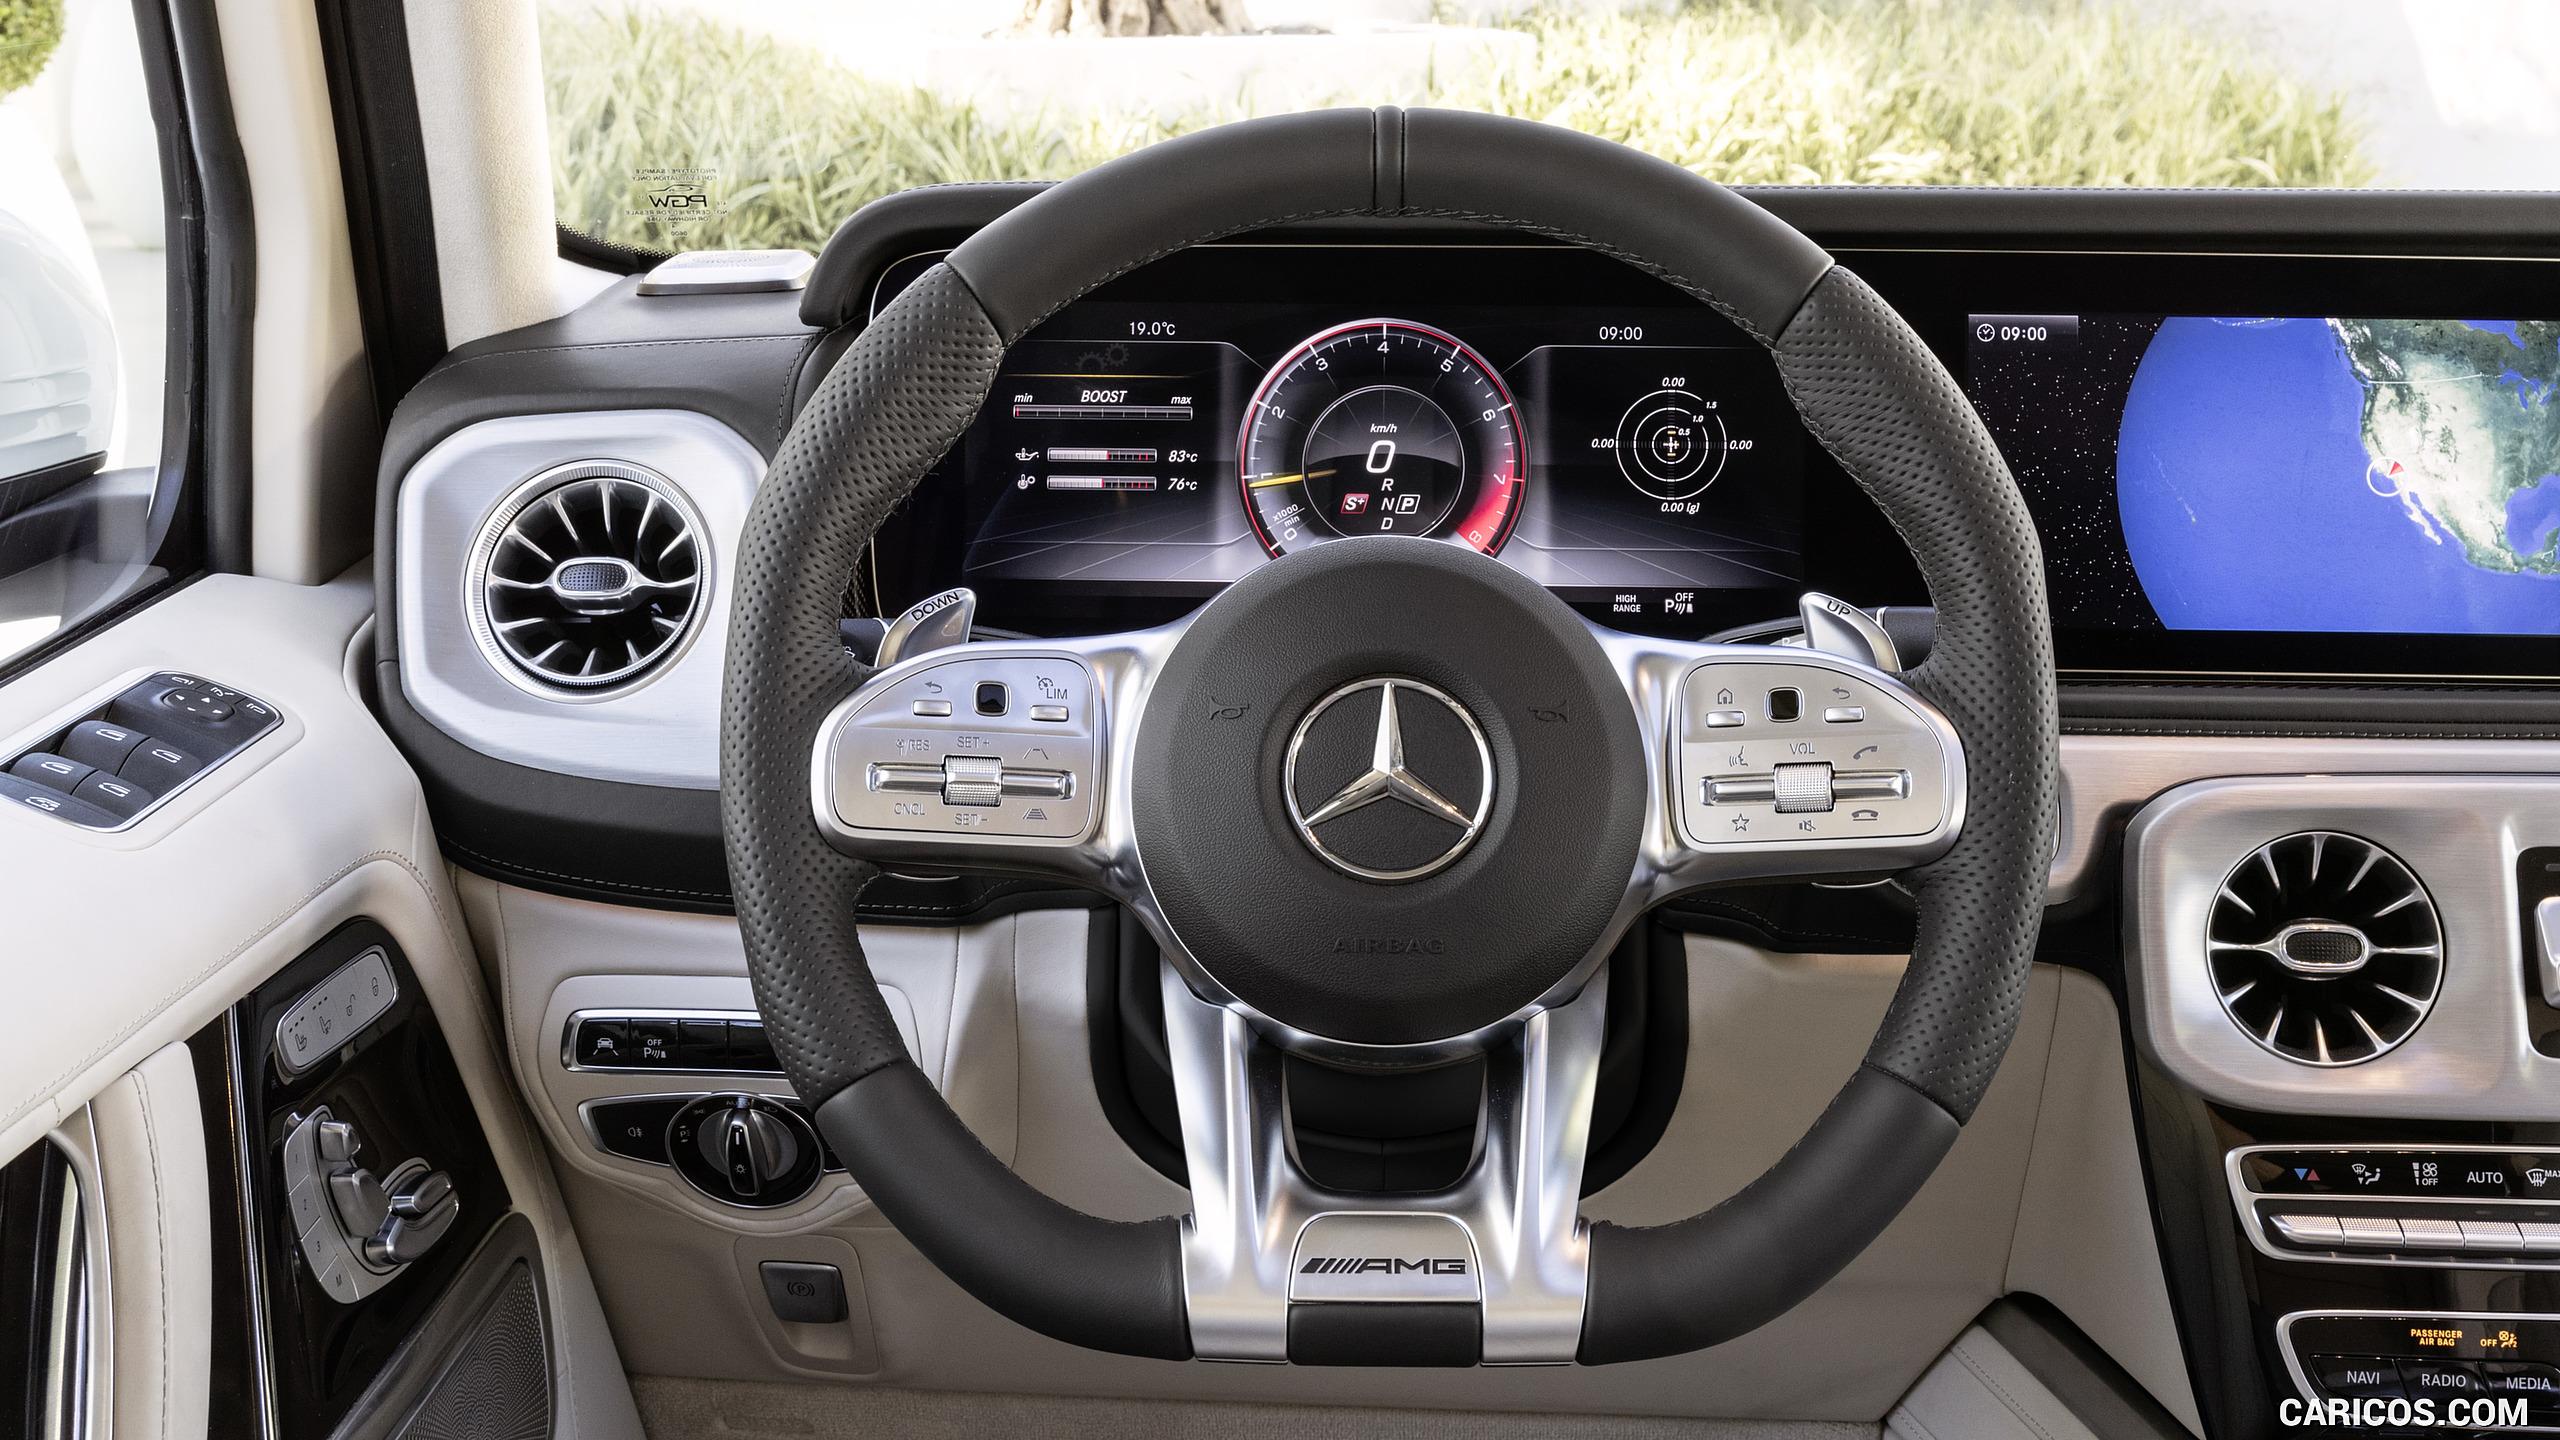 2019 Mercedes AMG G63 Mercedes AMG G 63 Exterieur designo 2560x1440